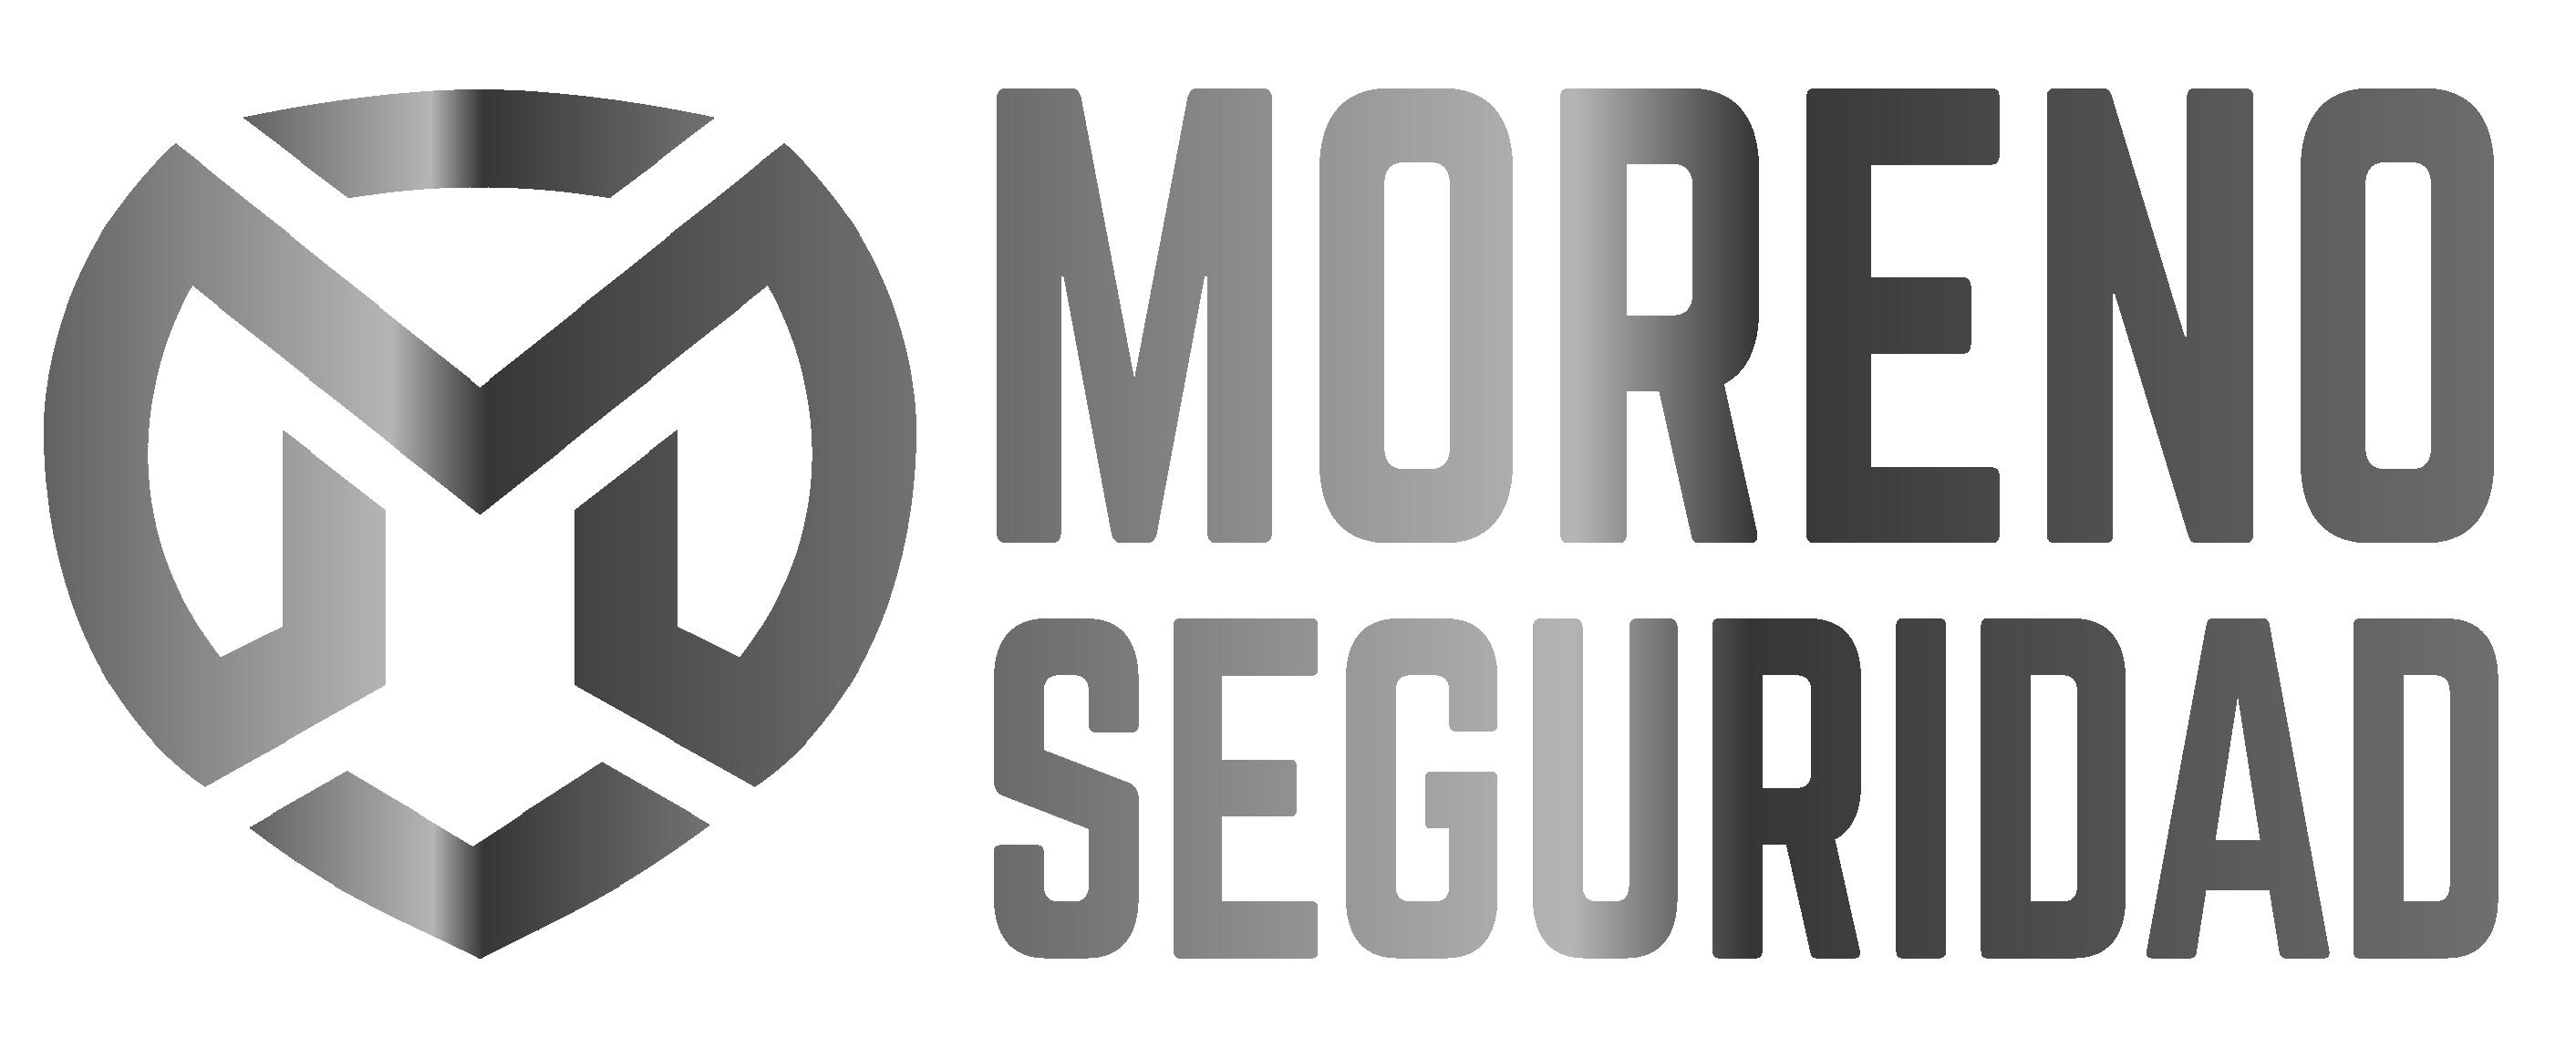 Seguridad Moreno